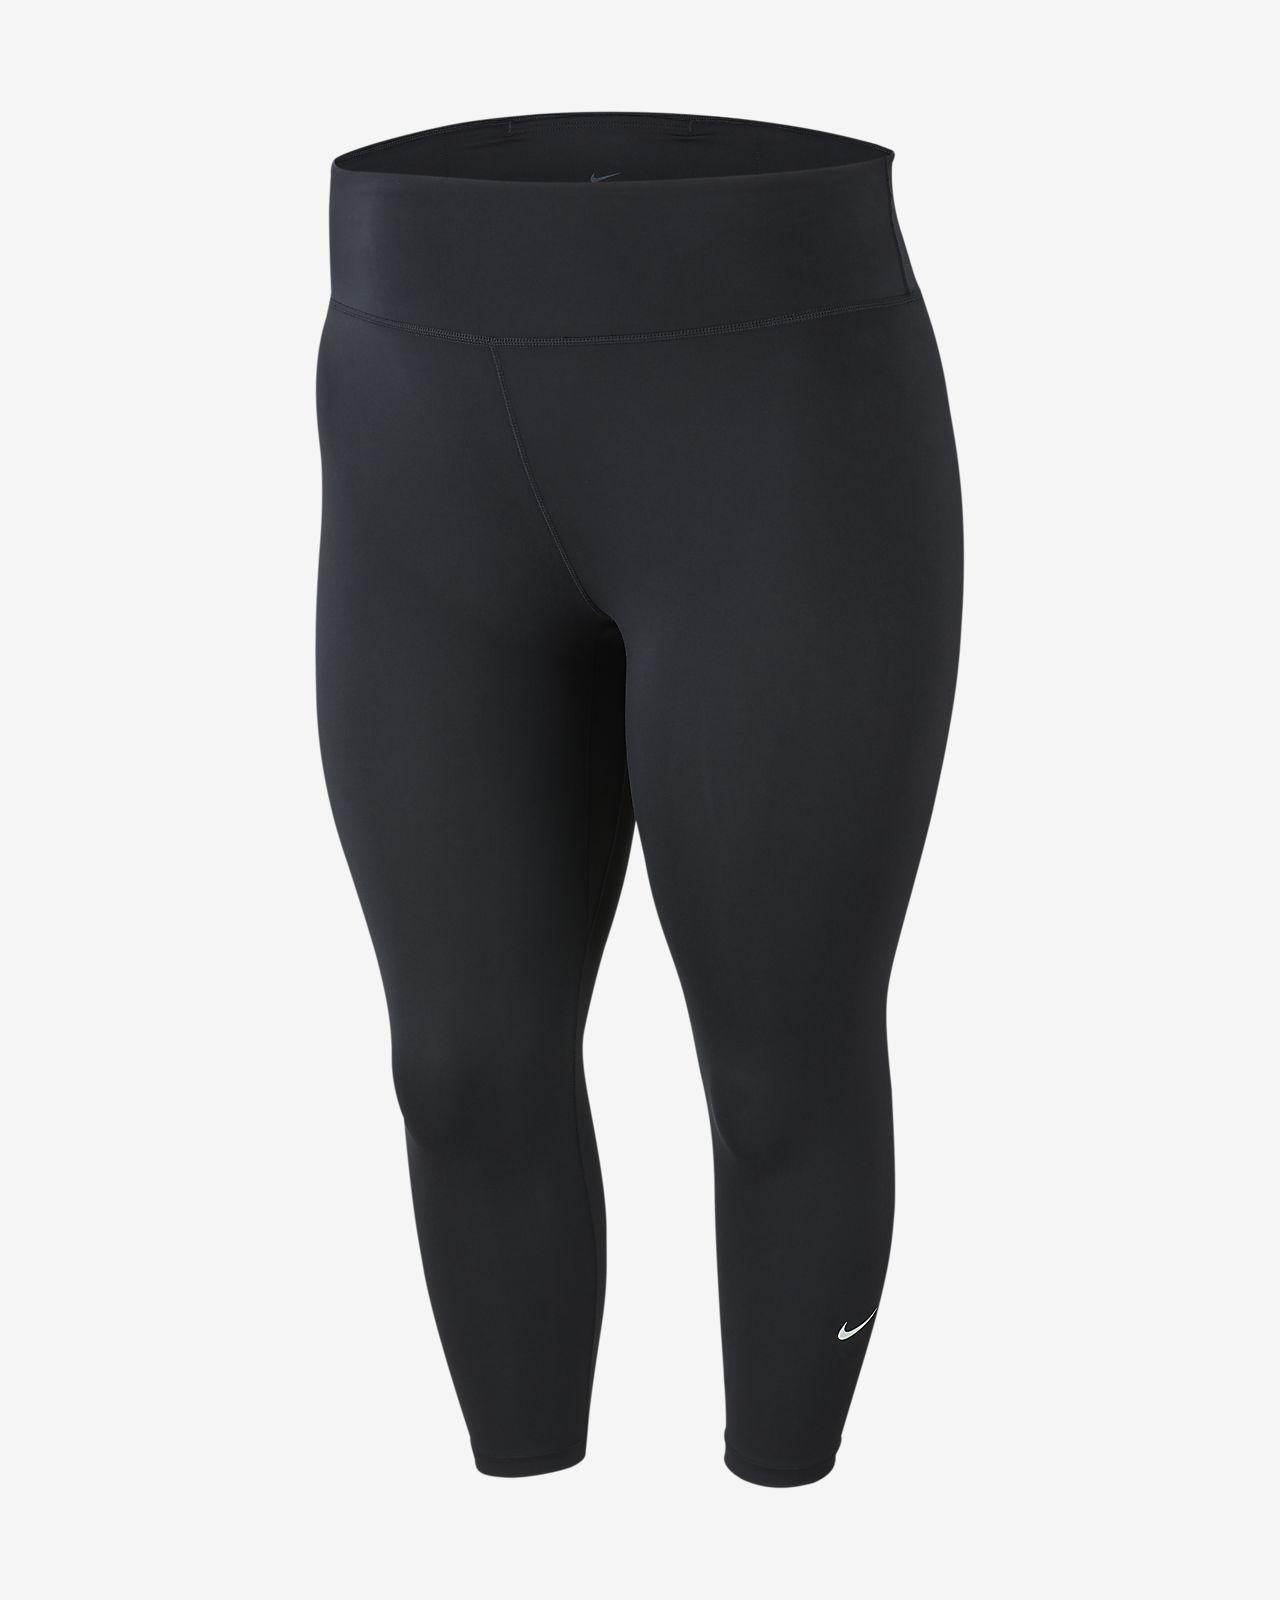 Pescadores para mujer (talla grande) Nike One